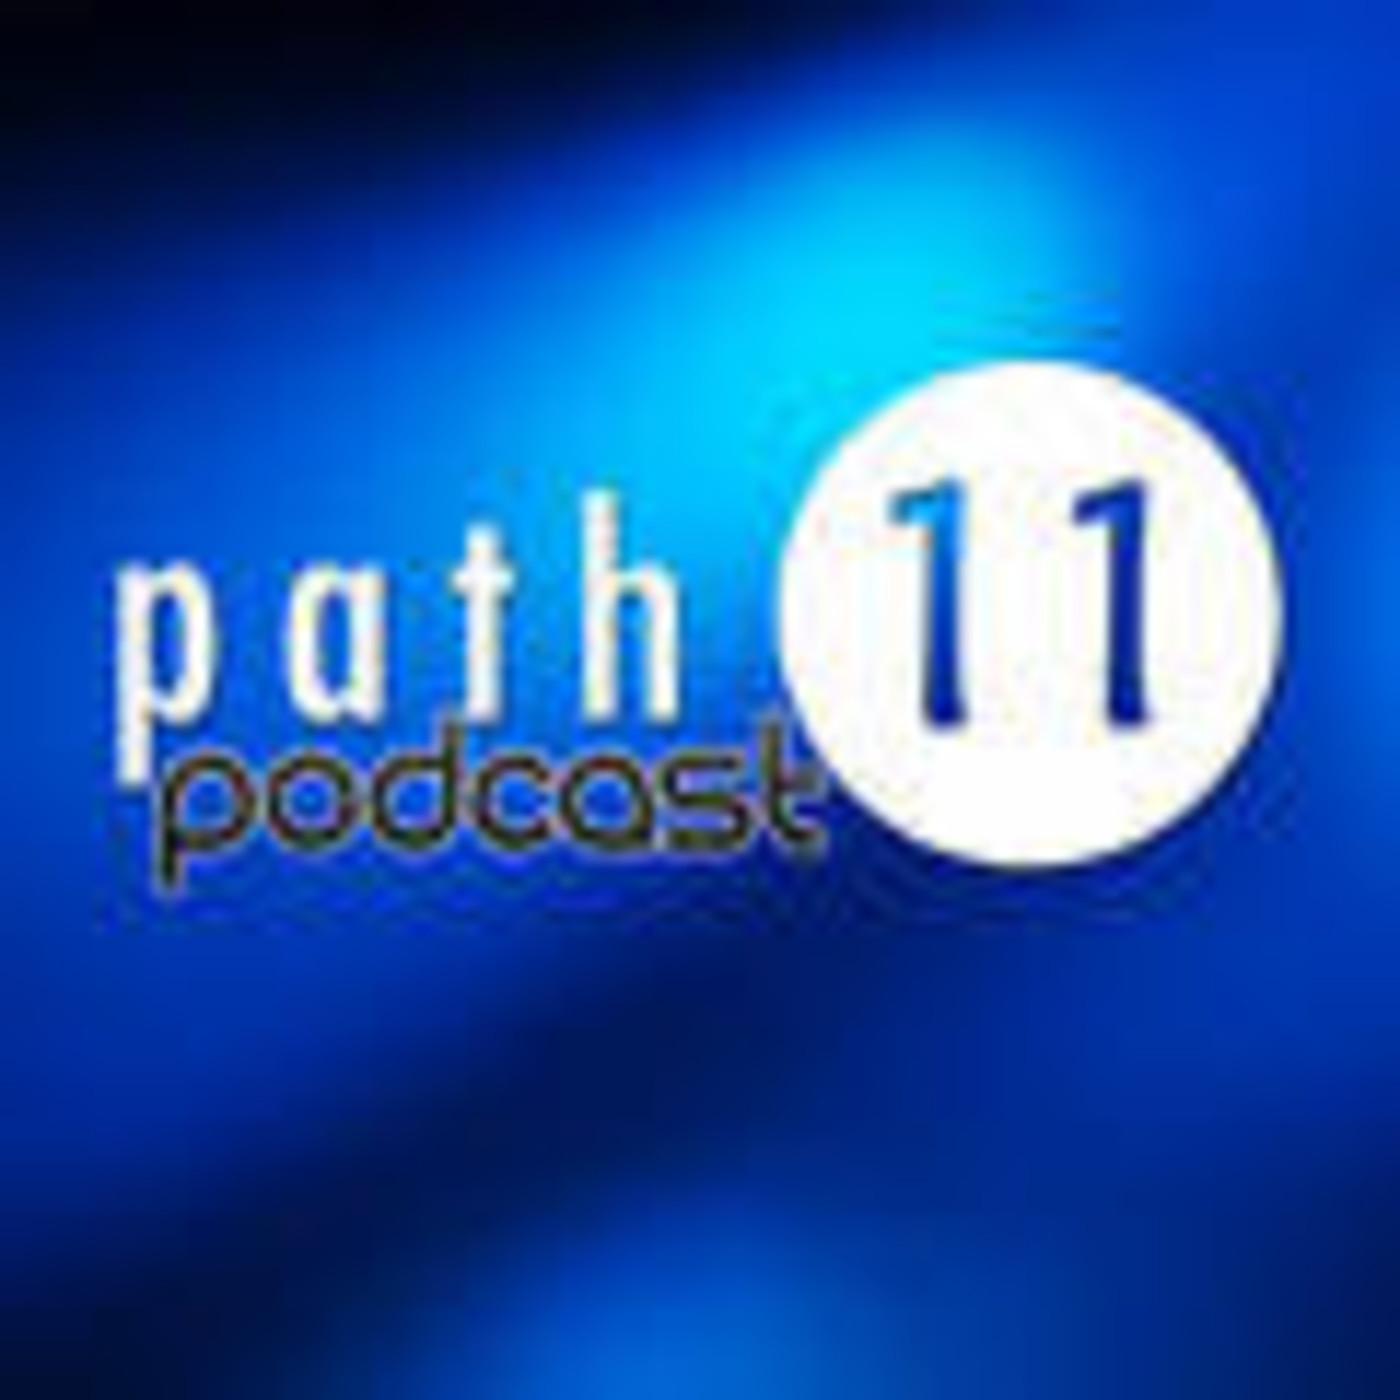 Path11 Productions LLC